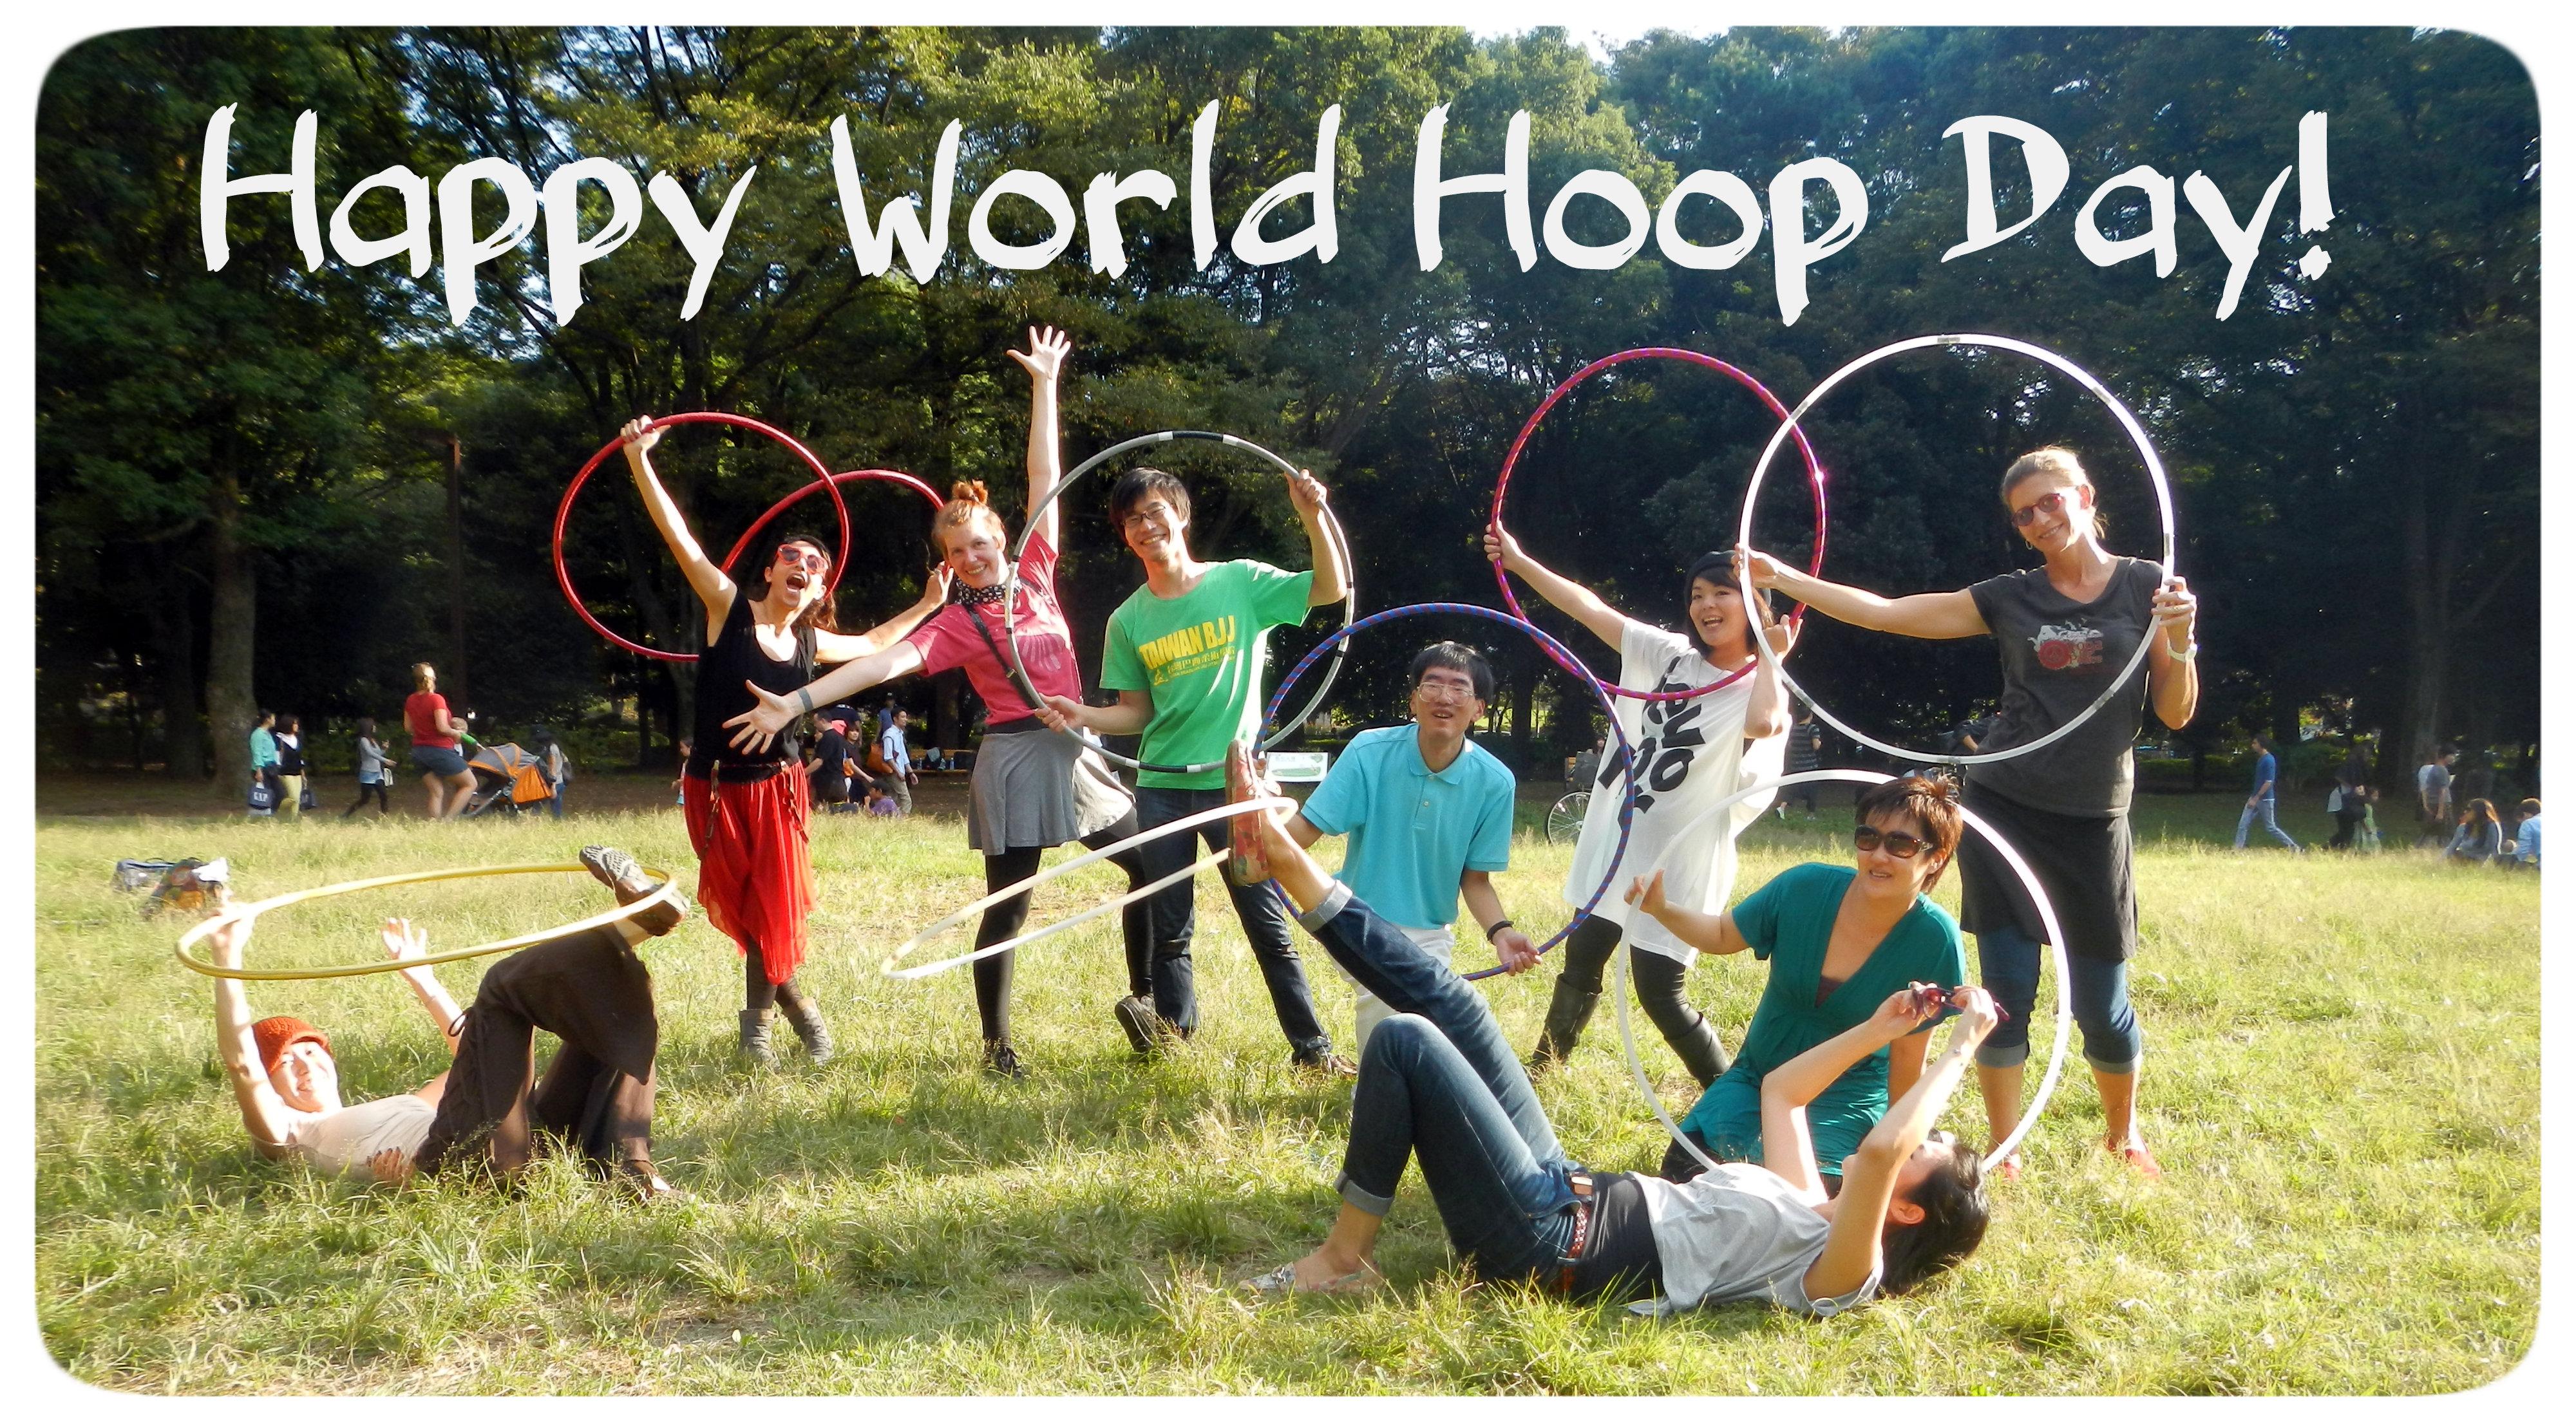 2013-09-29-WHD Dance -happy